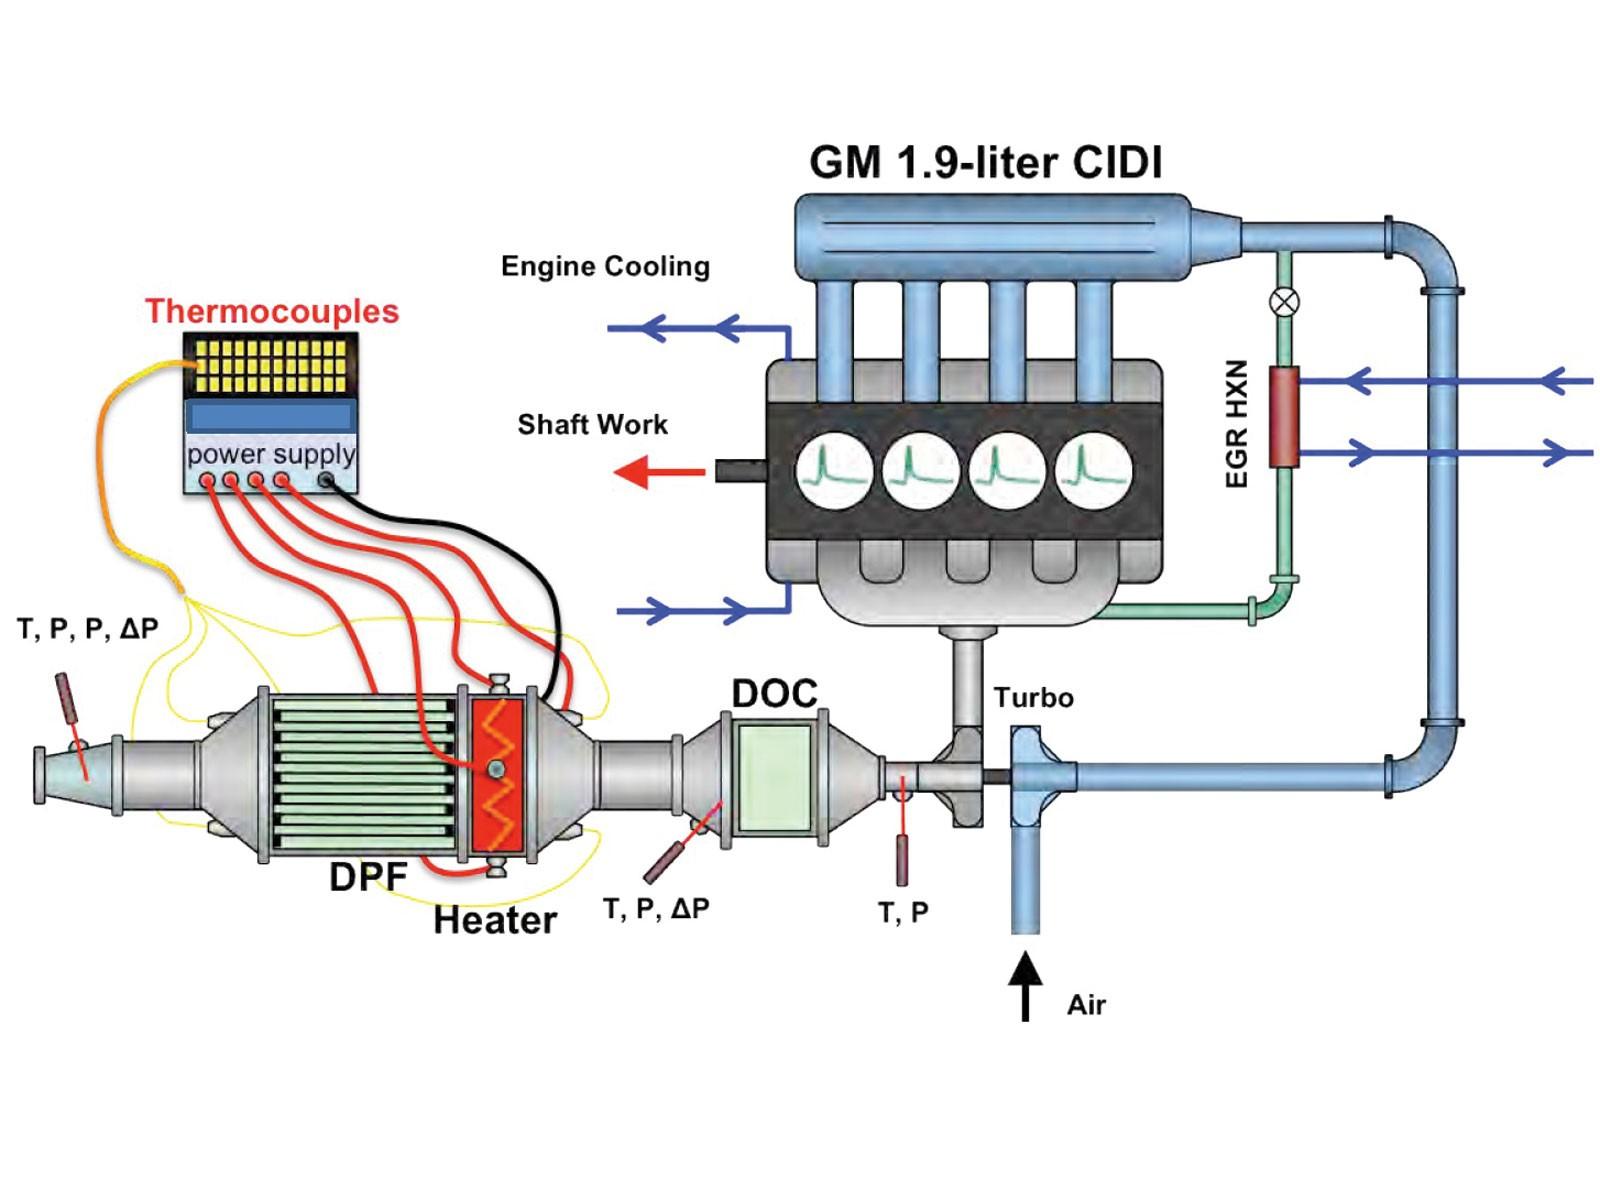 diesel engine block diagram electric generator diagram eee electronics of diesel  engine block diagram automotive engine